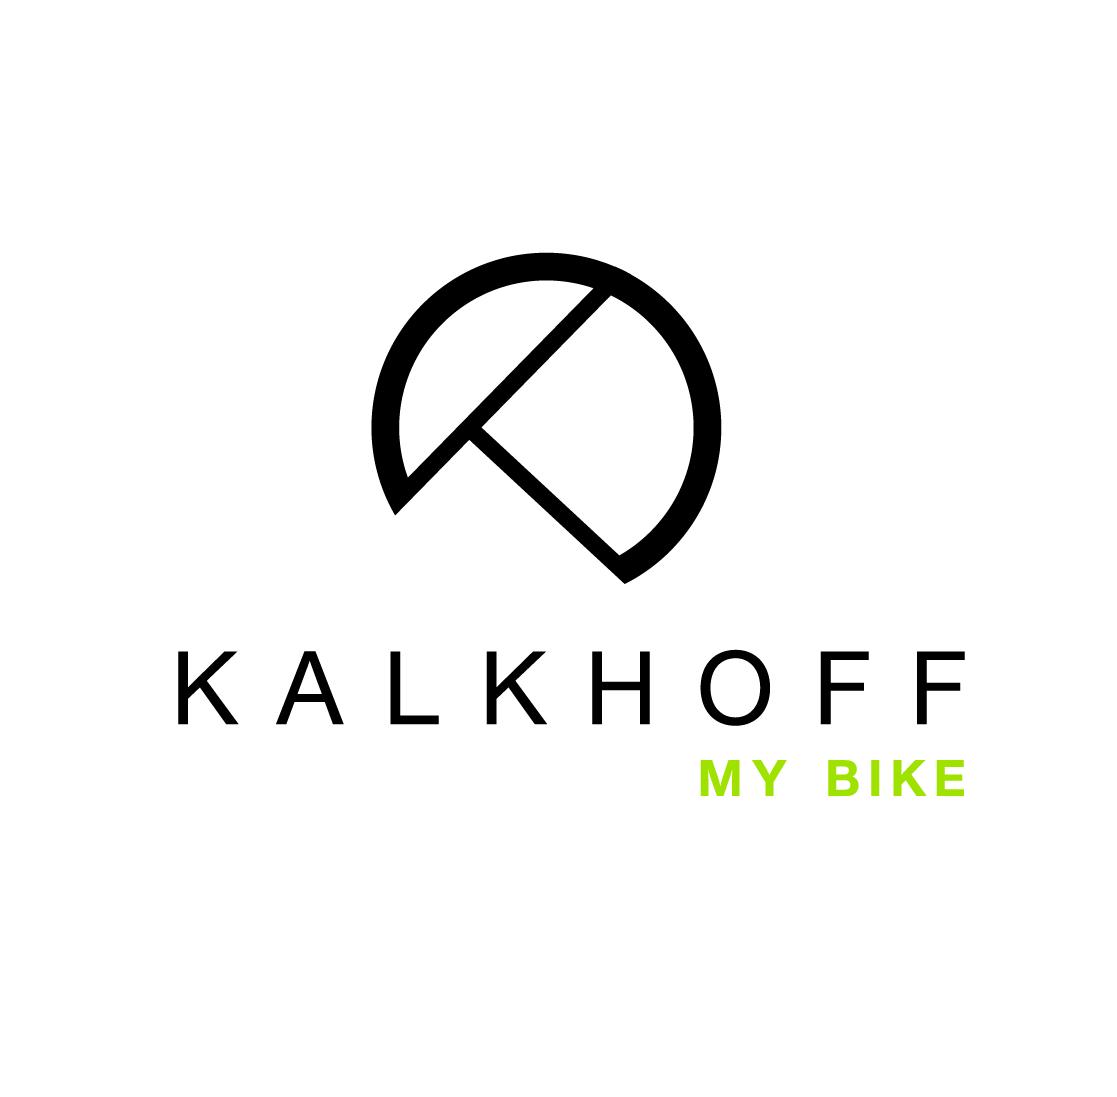 Kalkhoff Bike